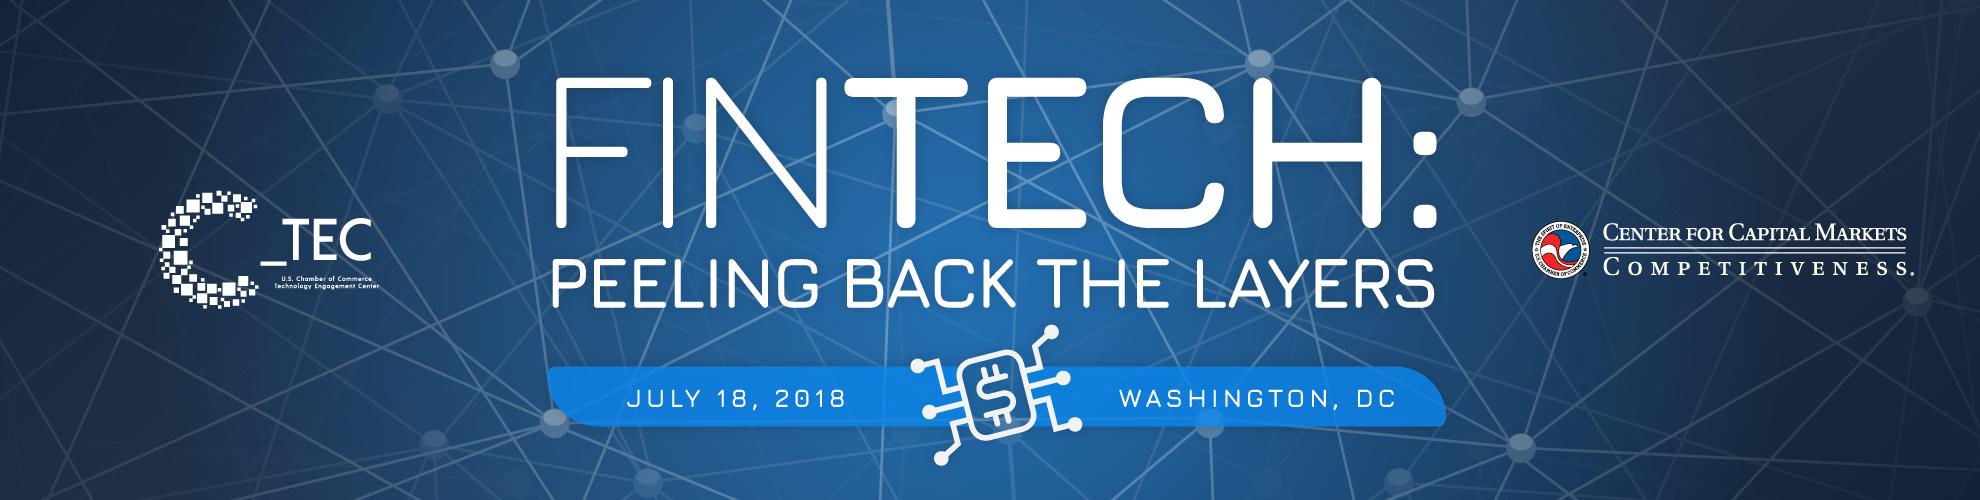 FinTech: Peeling Back the Layers